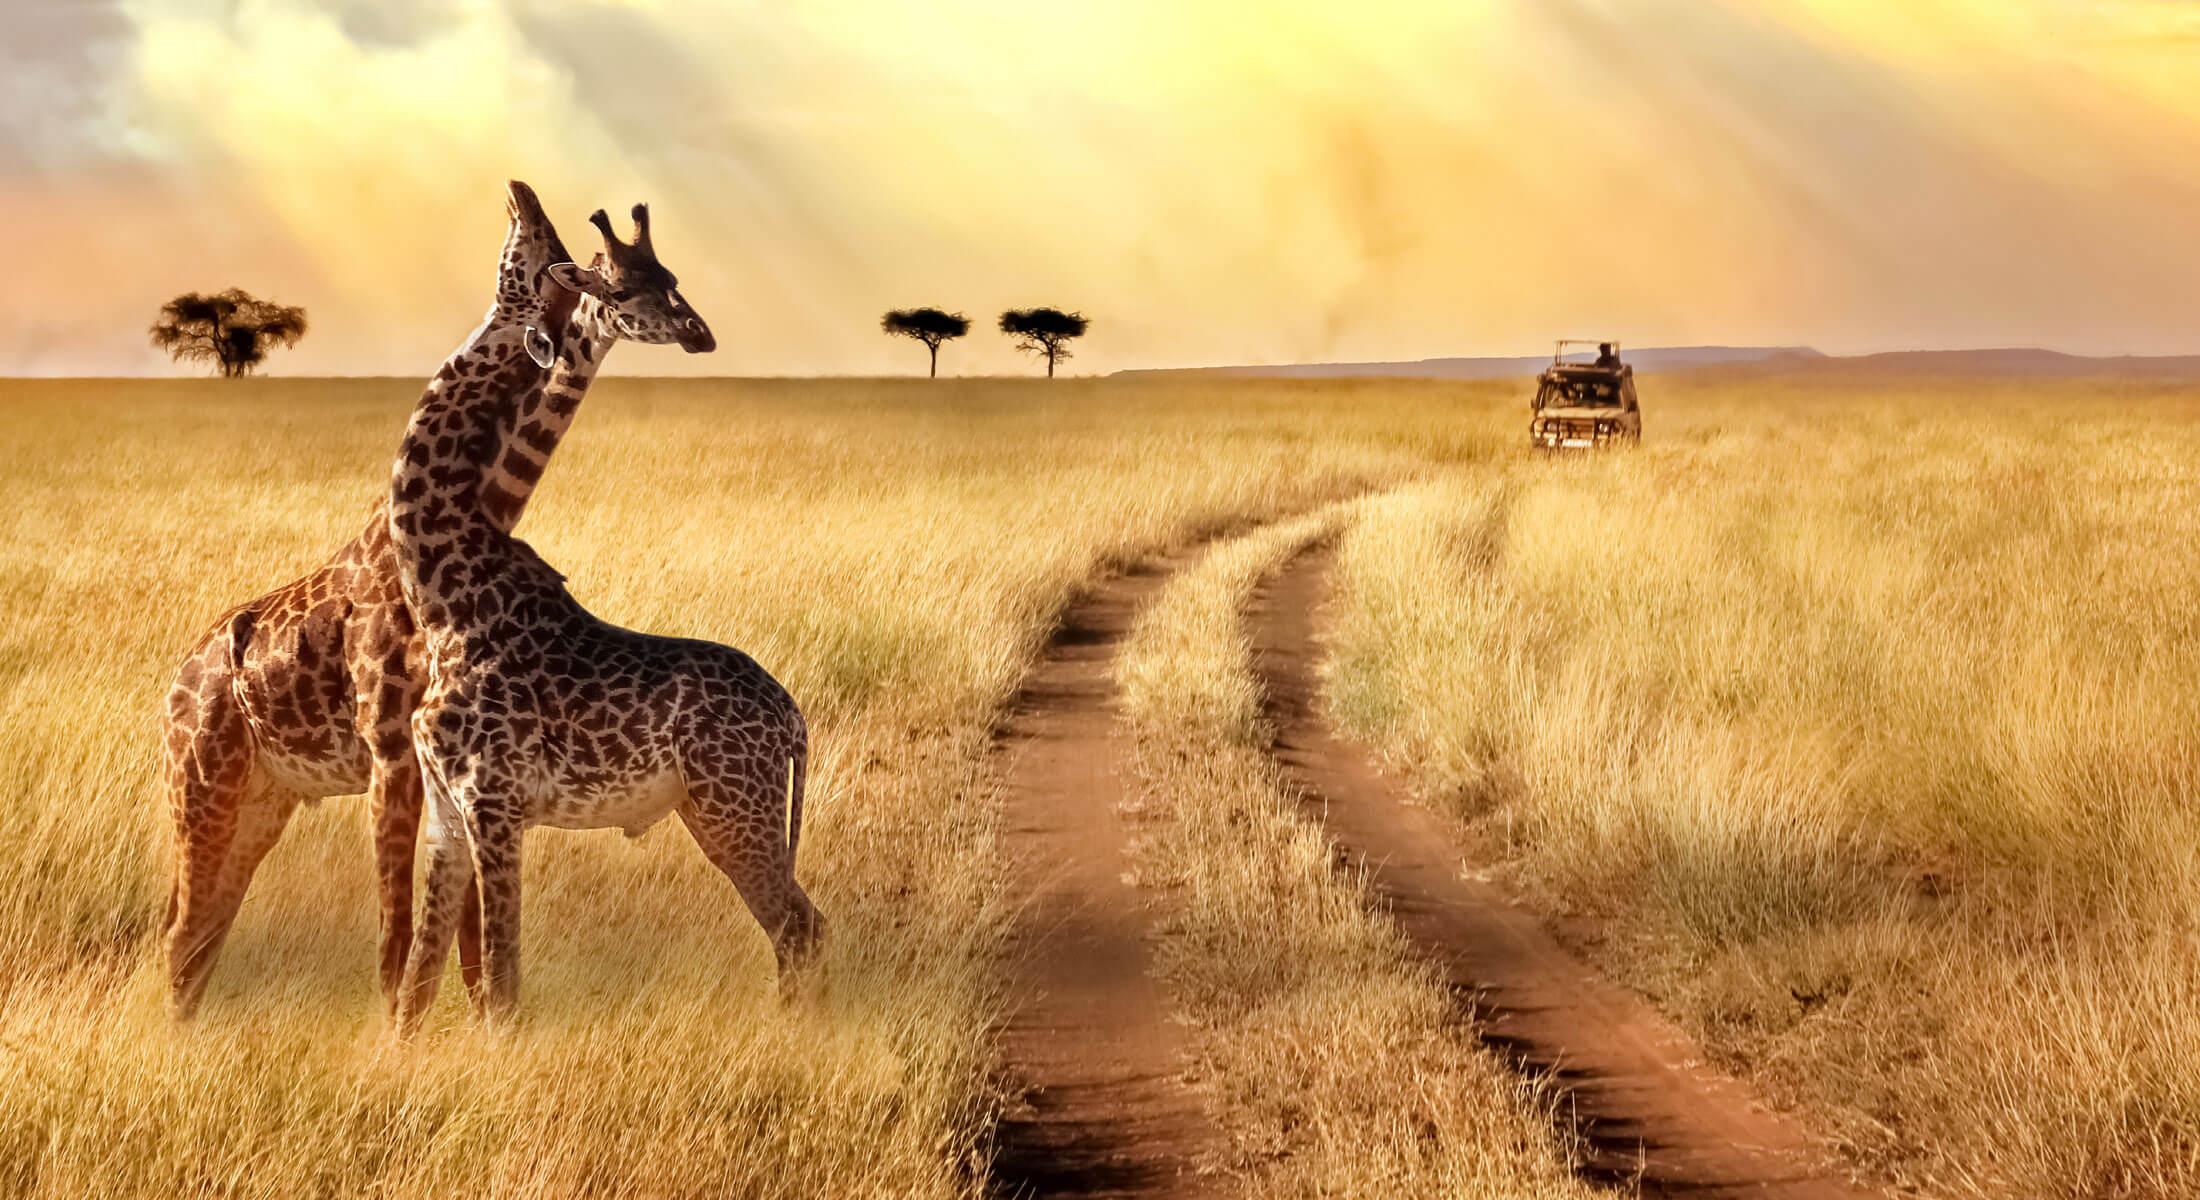 Two giraffes seen on a safari in Africa